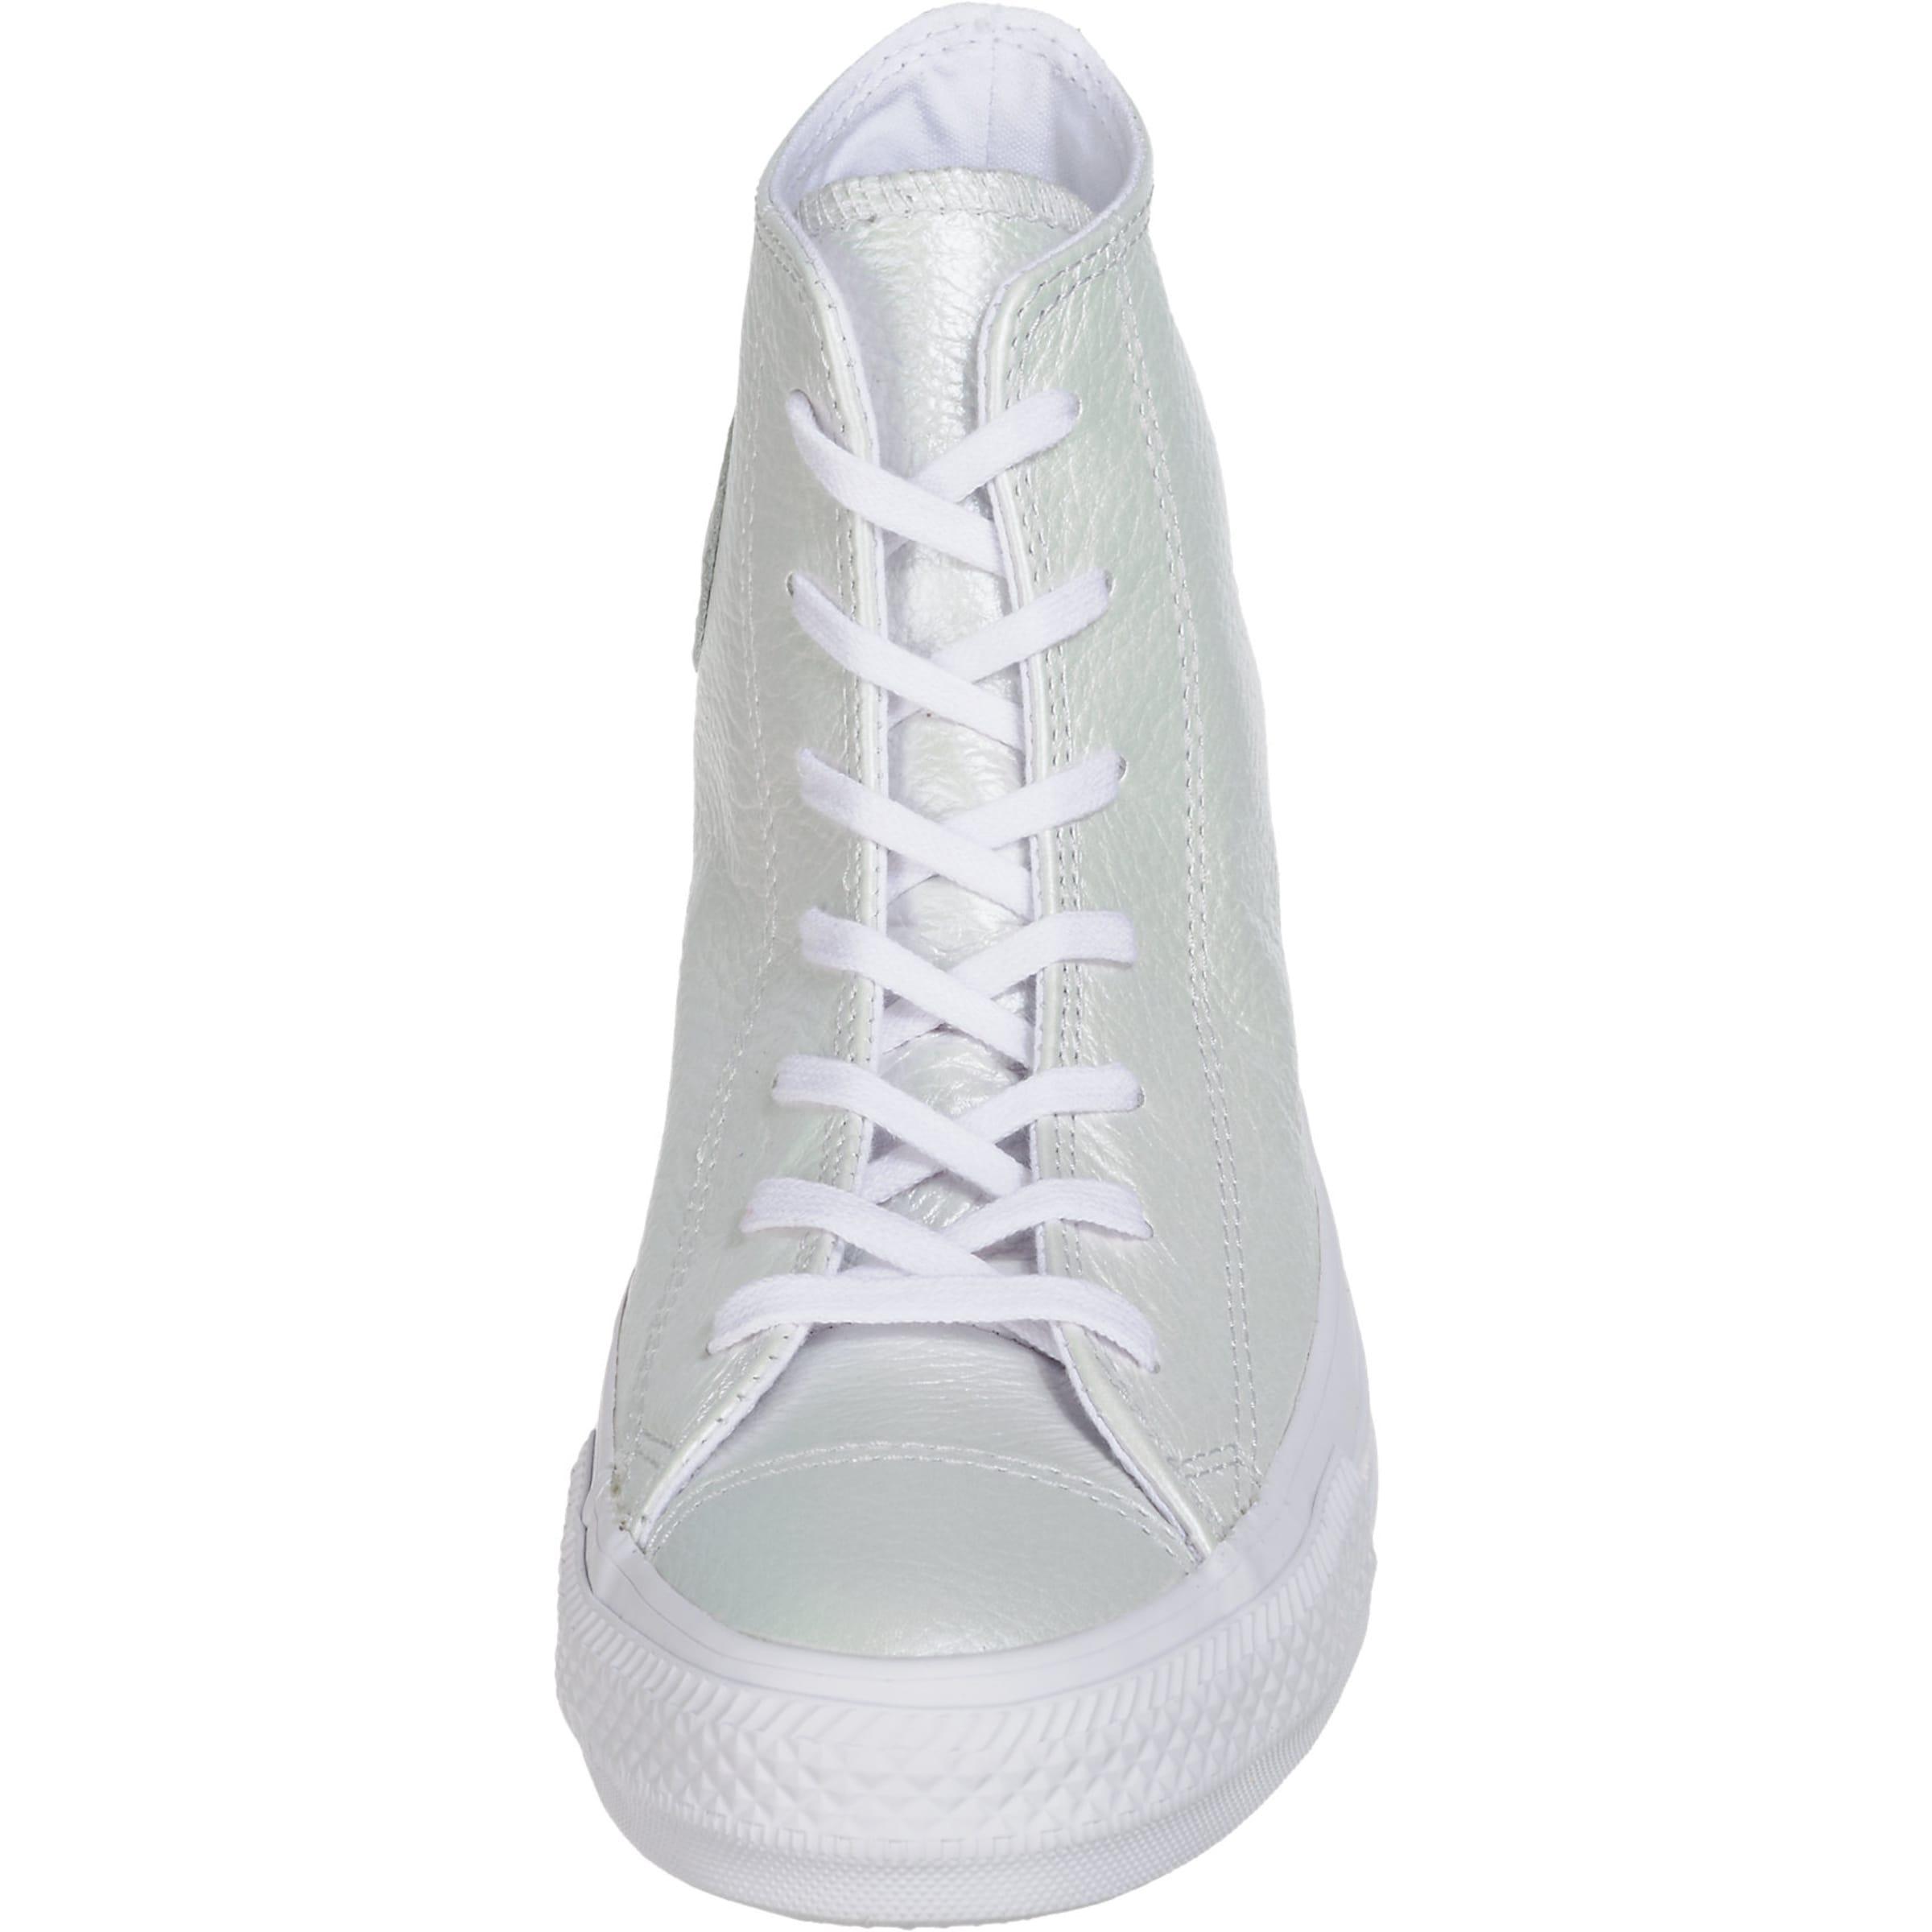 Star' CONVERSE 'Chuck All High CONVERSE Taylor Taylor Sneakers 'Chuck aYzxa